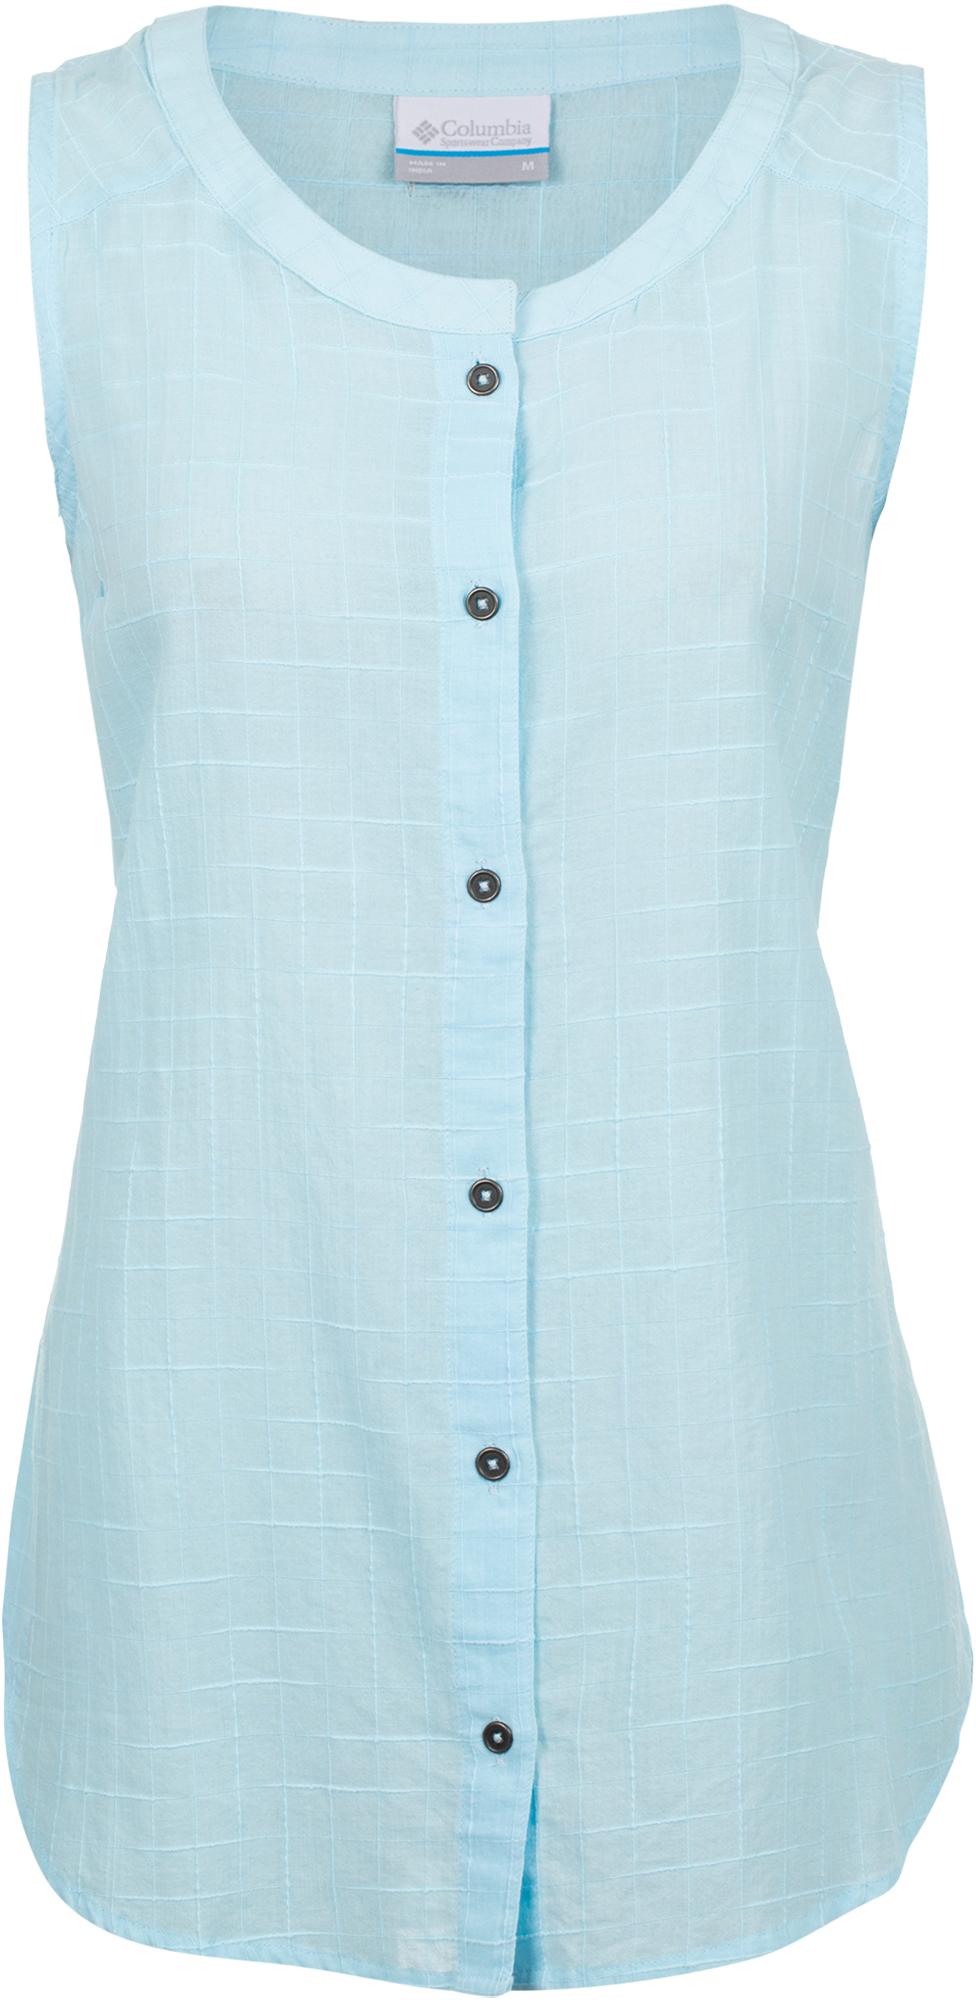 Columbia Рубашка женская Columbia Summer Ease, размер 48 рубашка женская bello belicci цвет темно синий sa1 9 размер xl 48